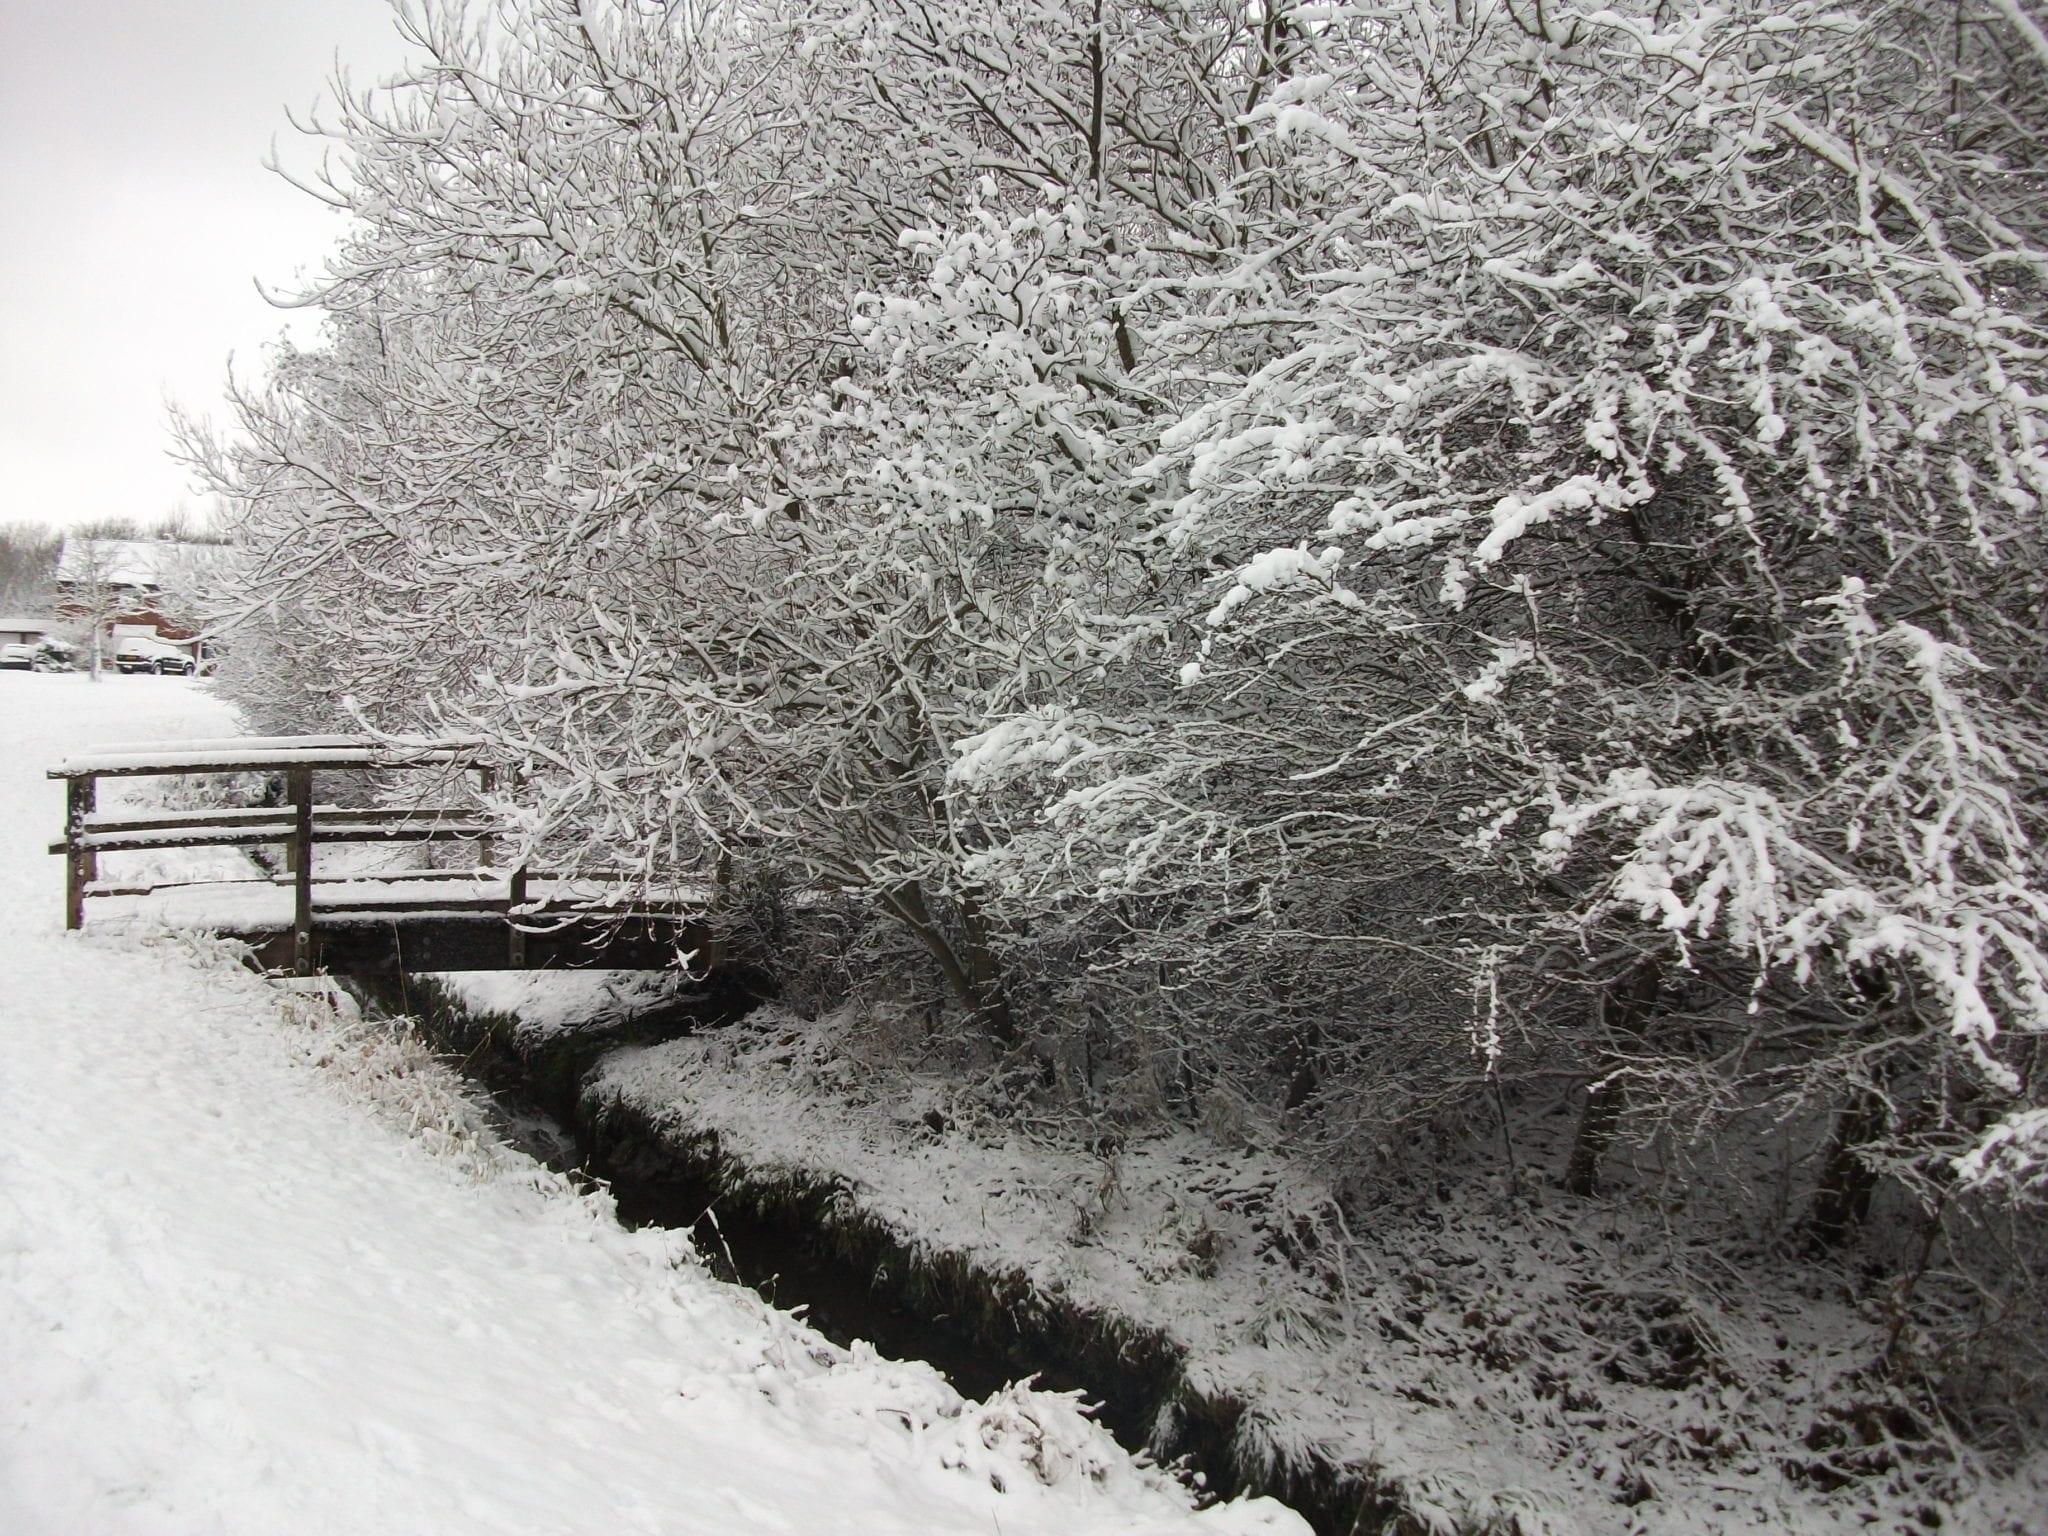 free-download-winter-bridge-desktop-wallpaper.jpg